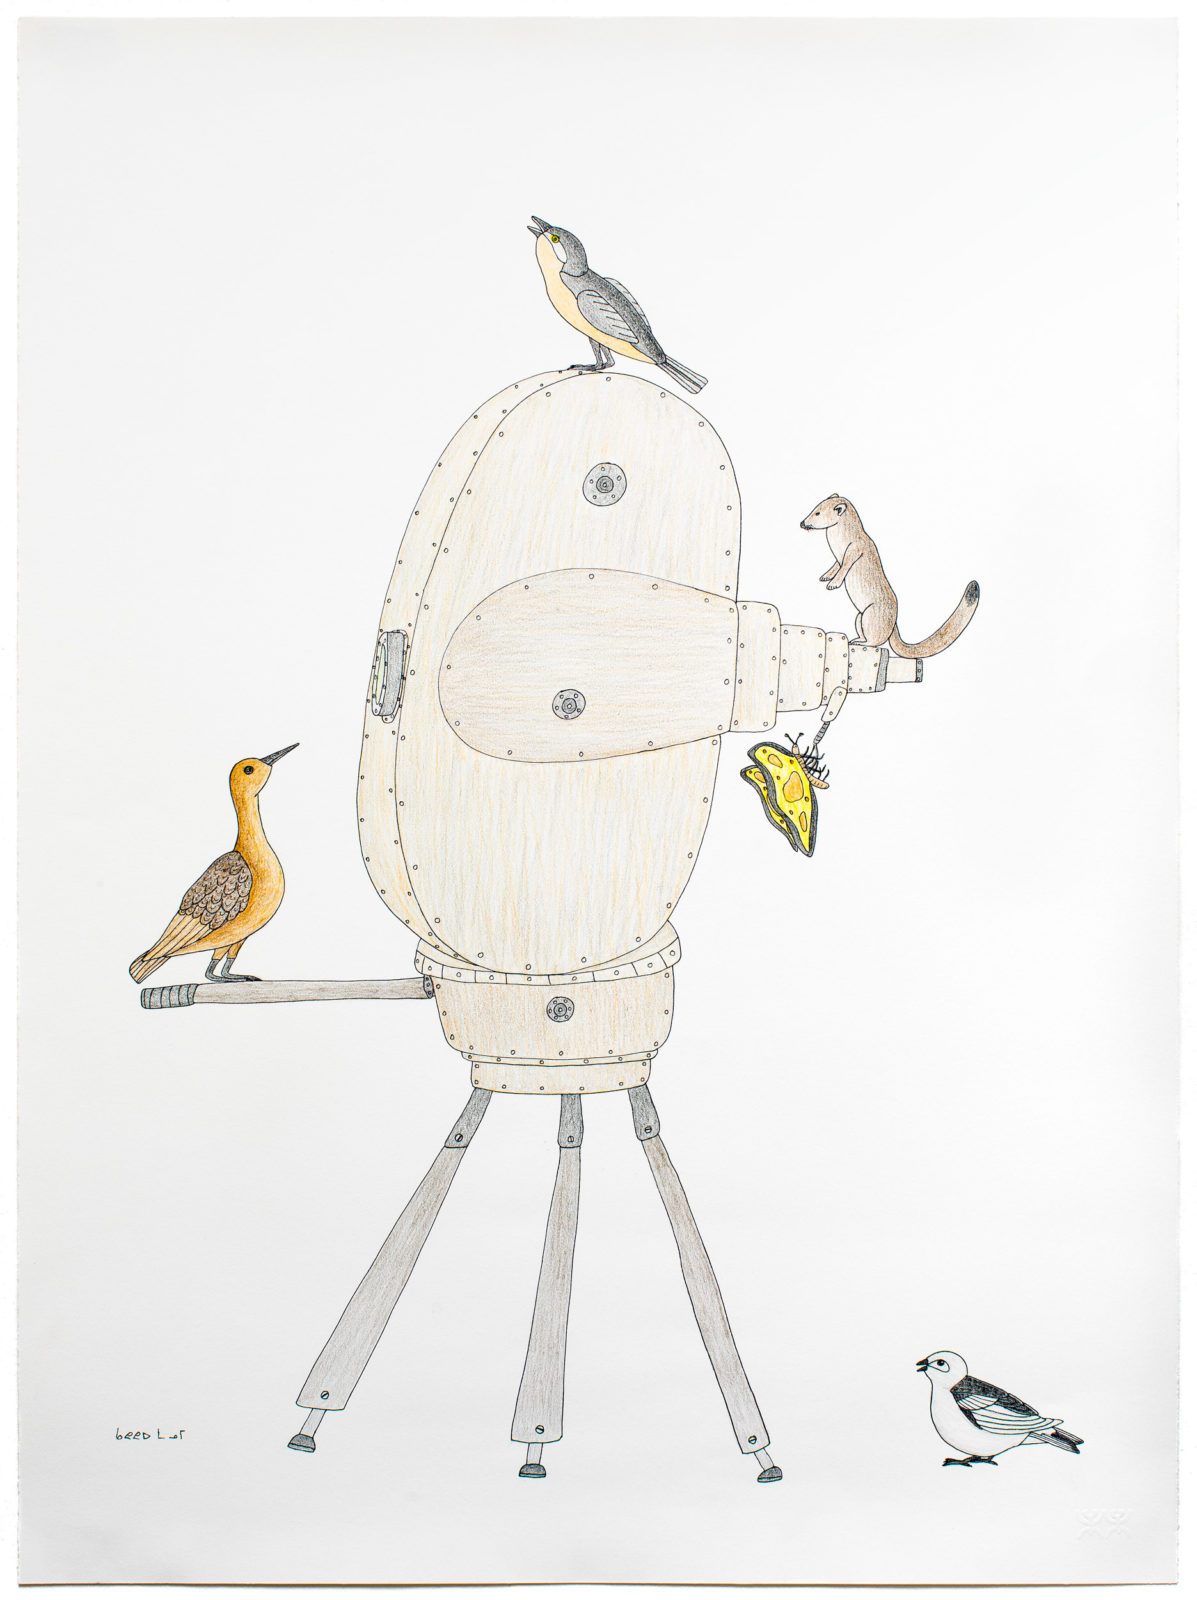 Qavavau Manumie - untitled (animals inspect camera)